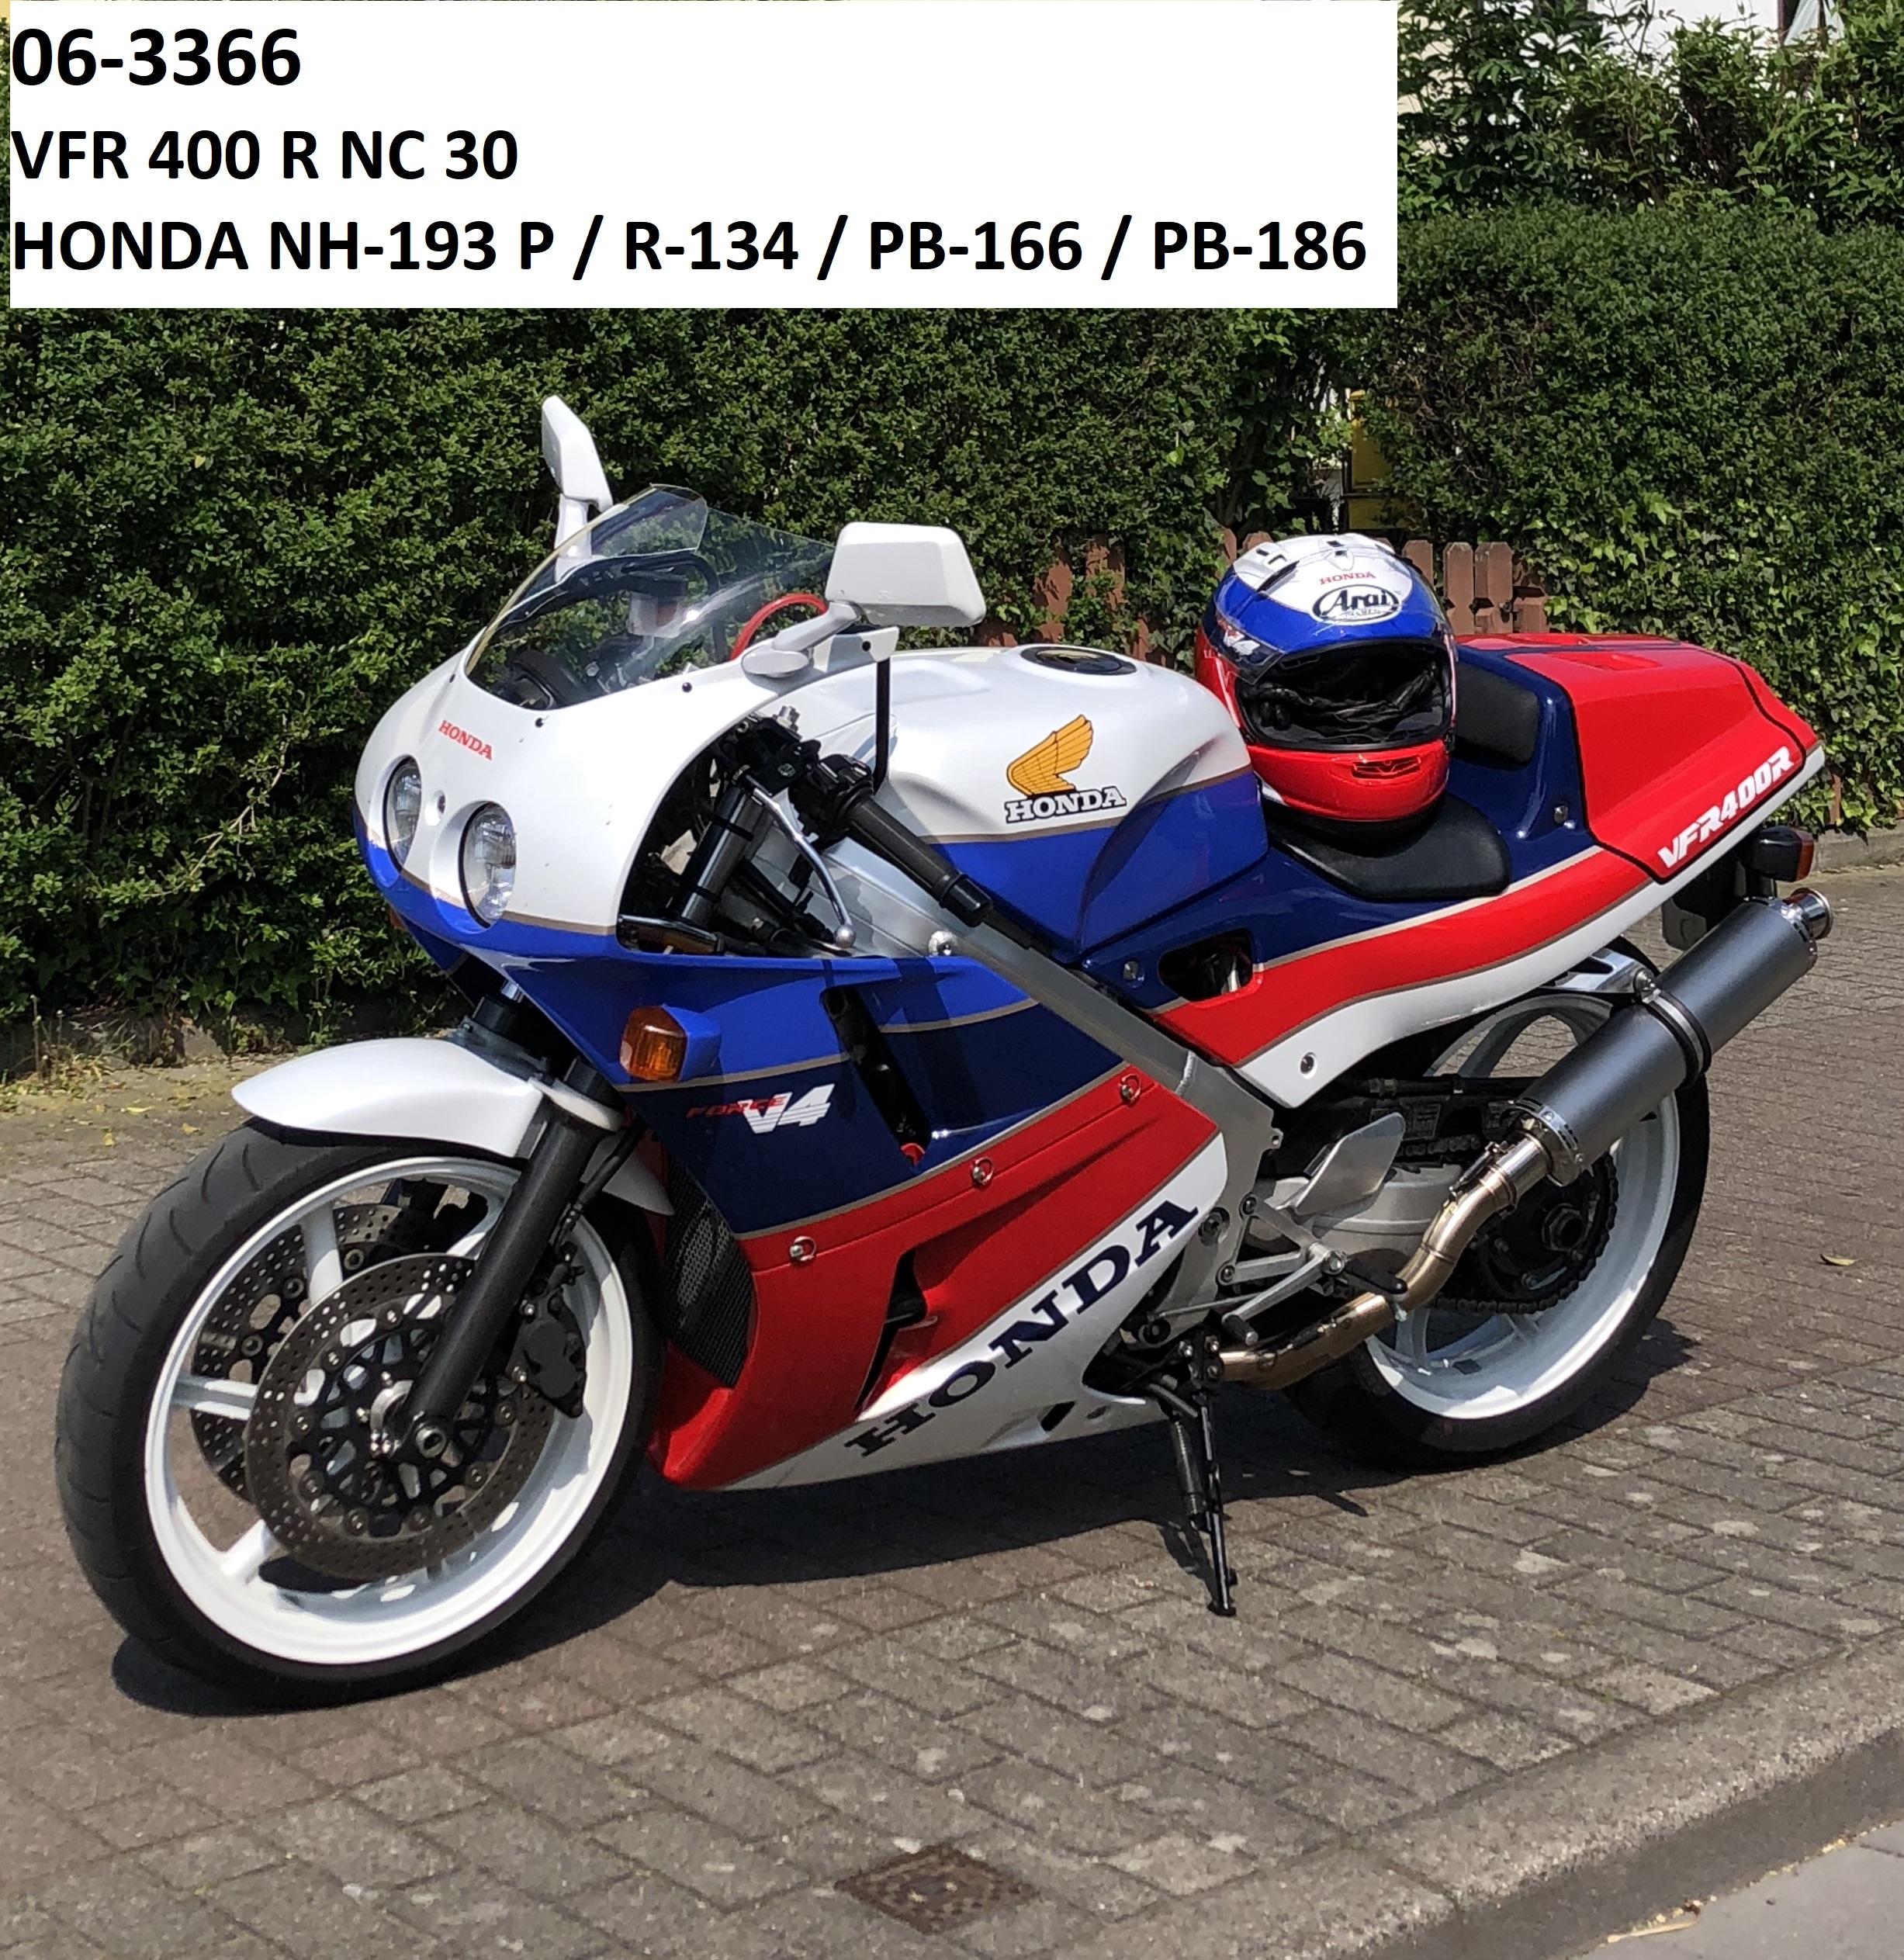 Honda VFR400R (NC30) in NH-193 P / R-134 / PB-166 / PB-186 /Streifengold RH-Lacke Lackiererei Motorradlackierung